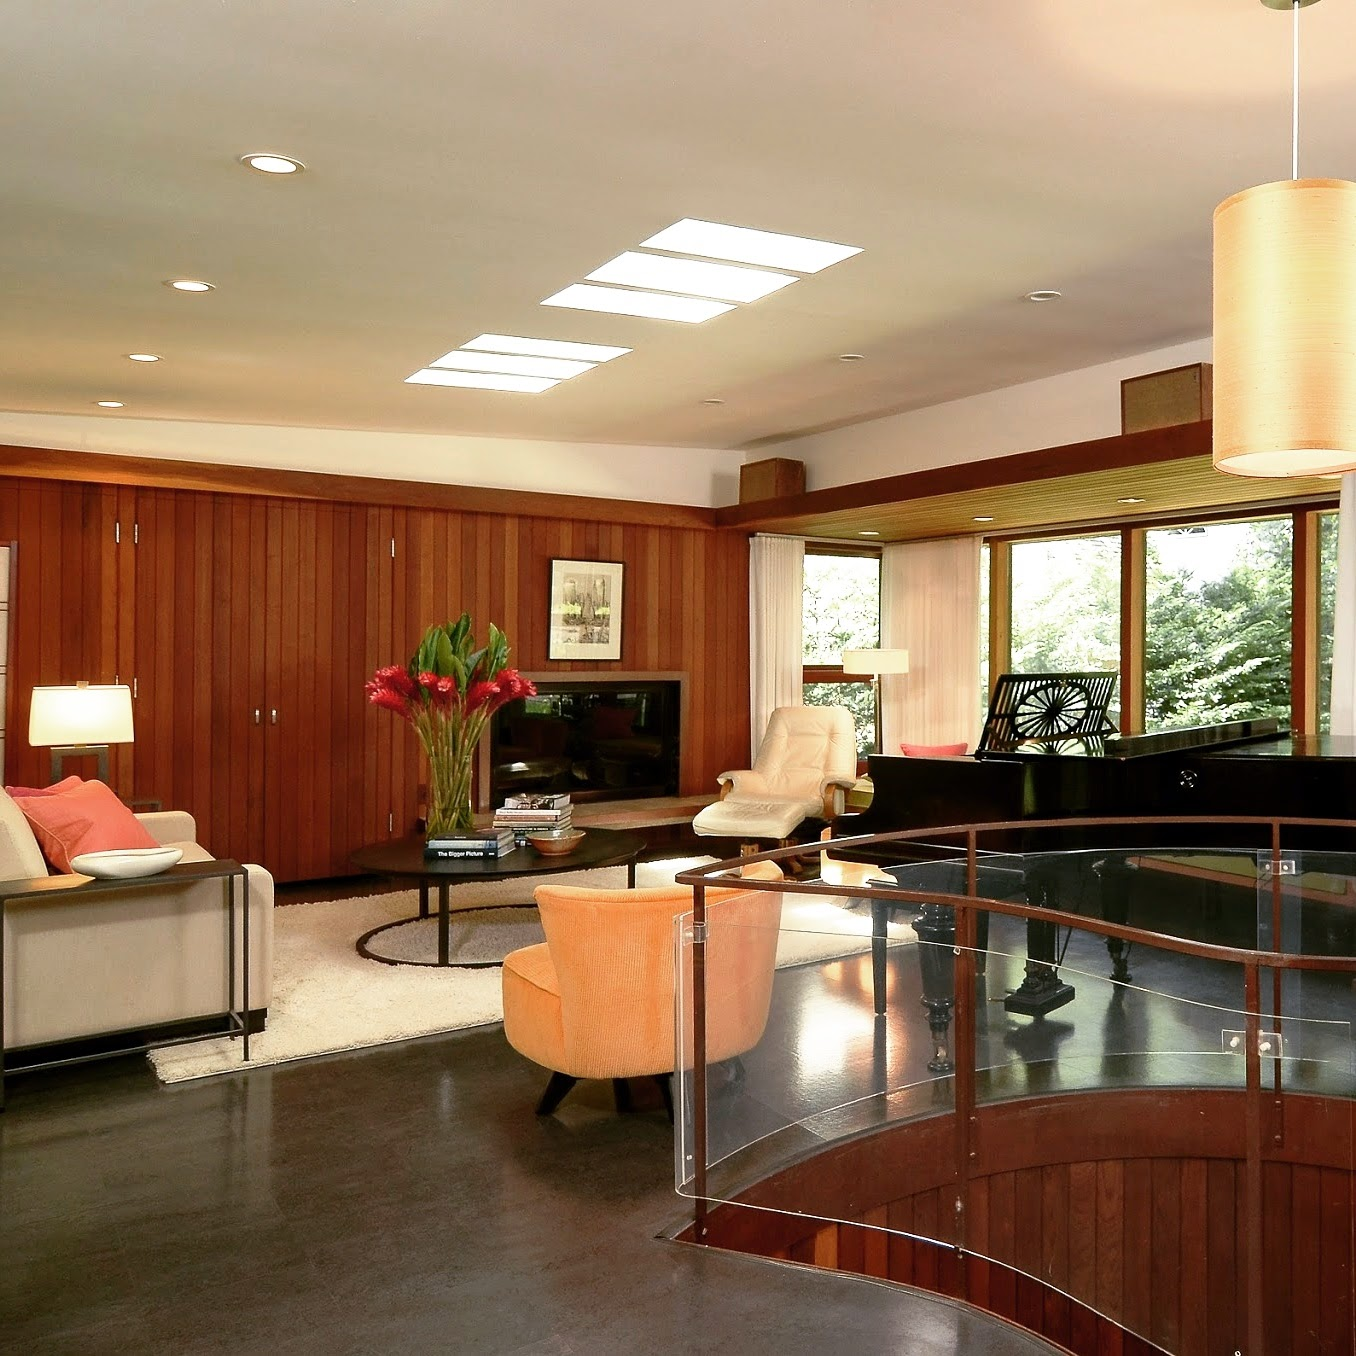 Winston Close and Elizabeth Scheu designed home - St. Paul, MN | Jay Nuhring | Home Stylist | Interior Designer